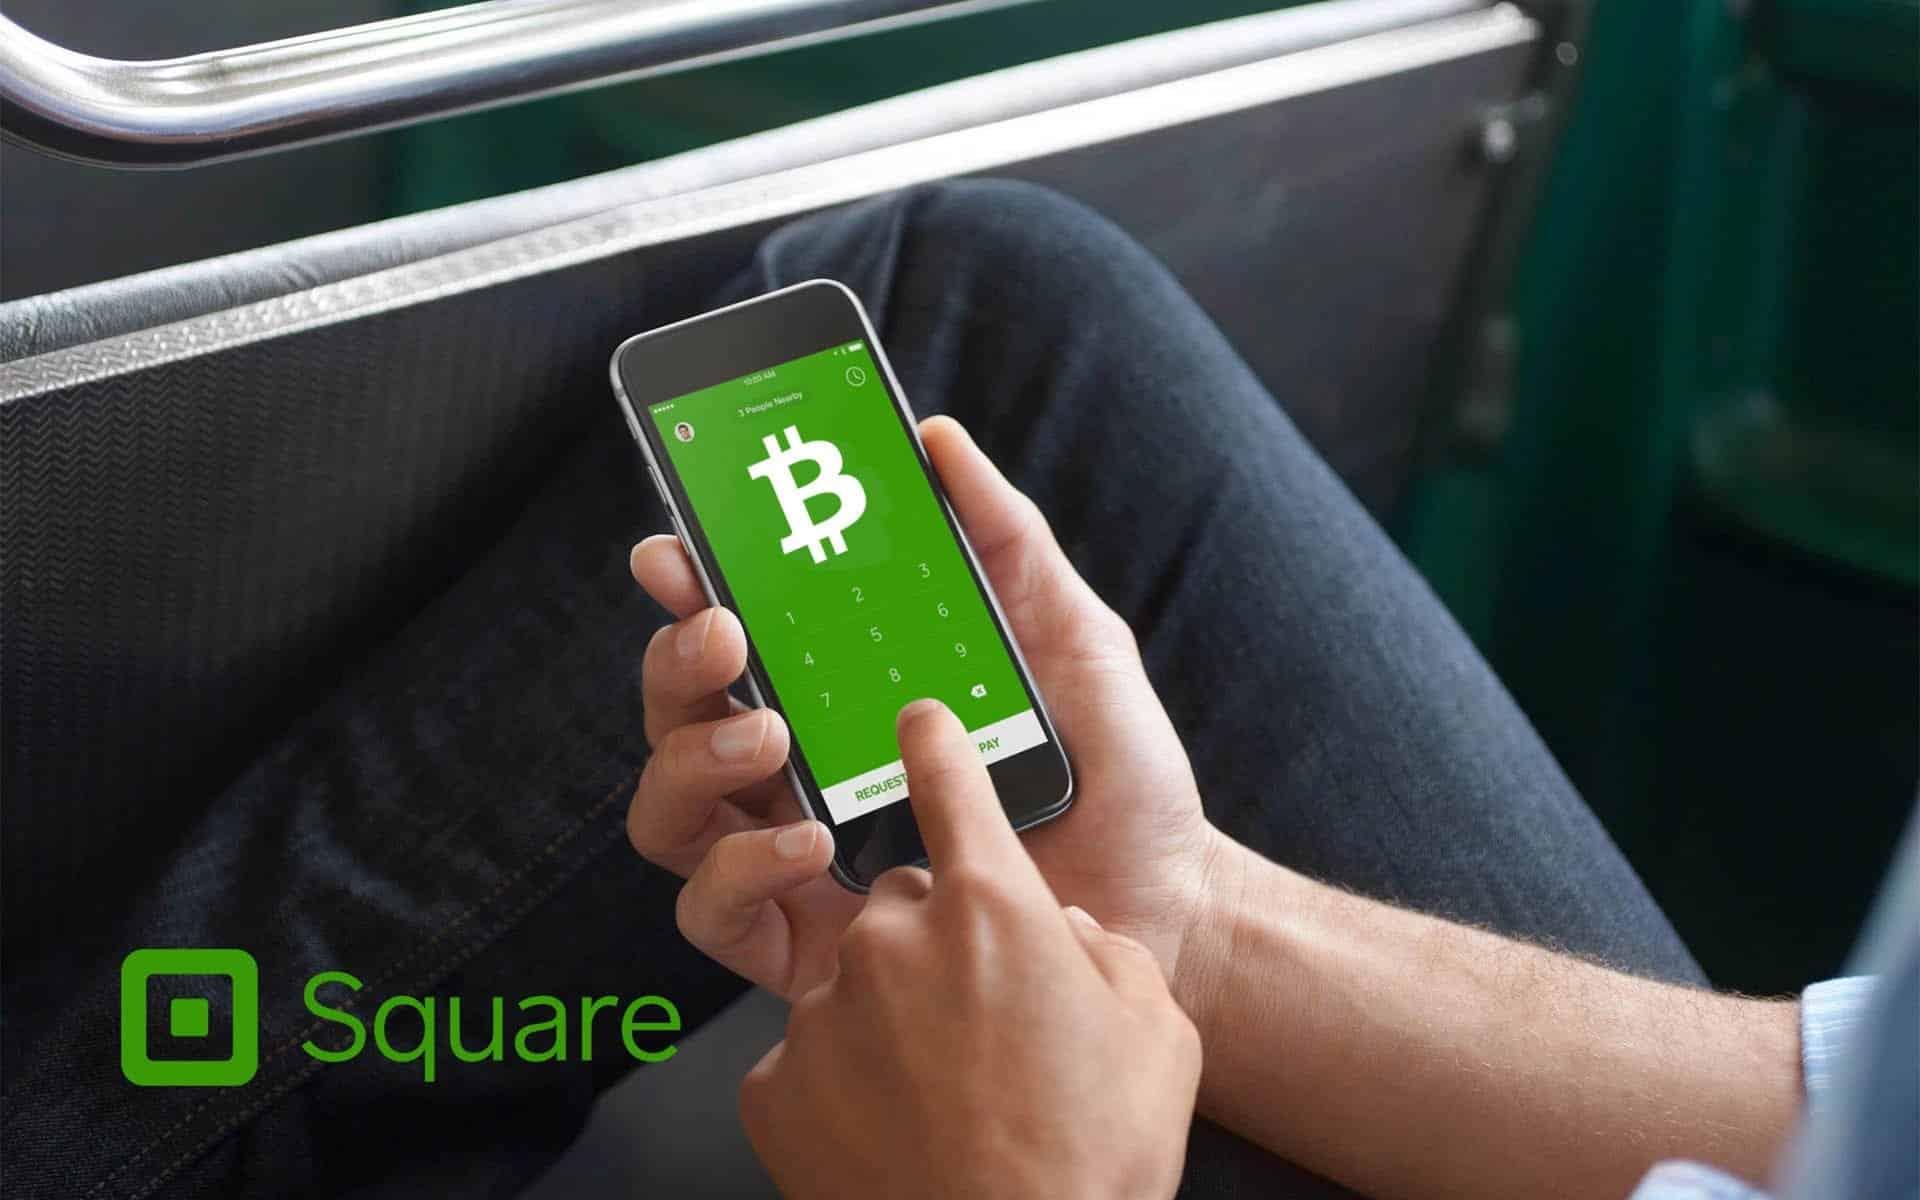 Jack Dorsey's Square Inc Invests $50 Million in Bitcoin (BTC)